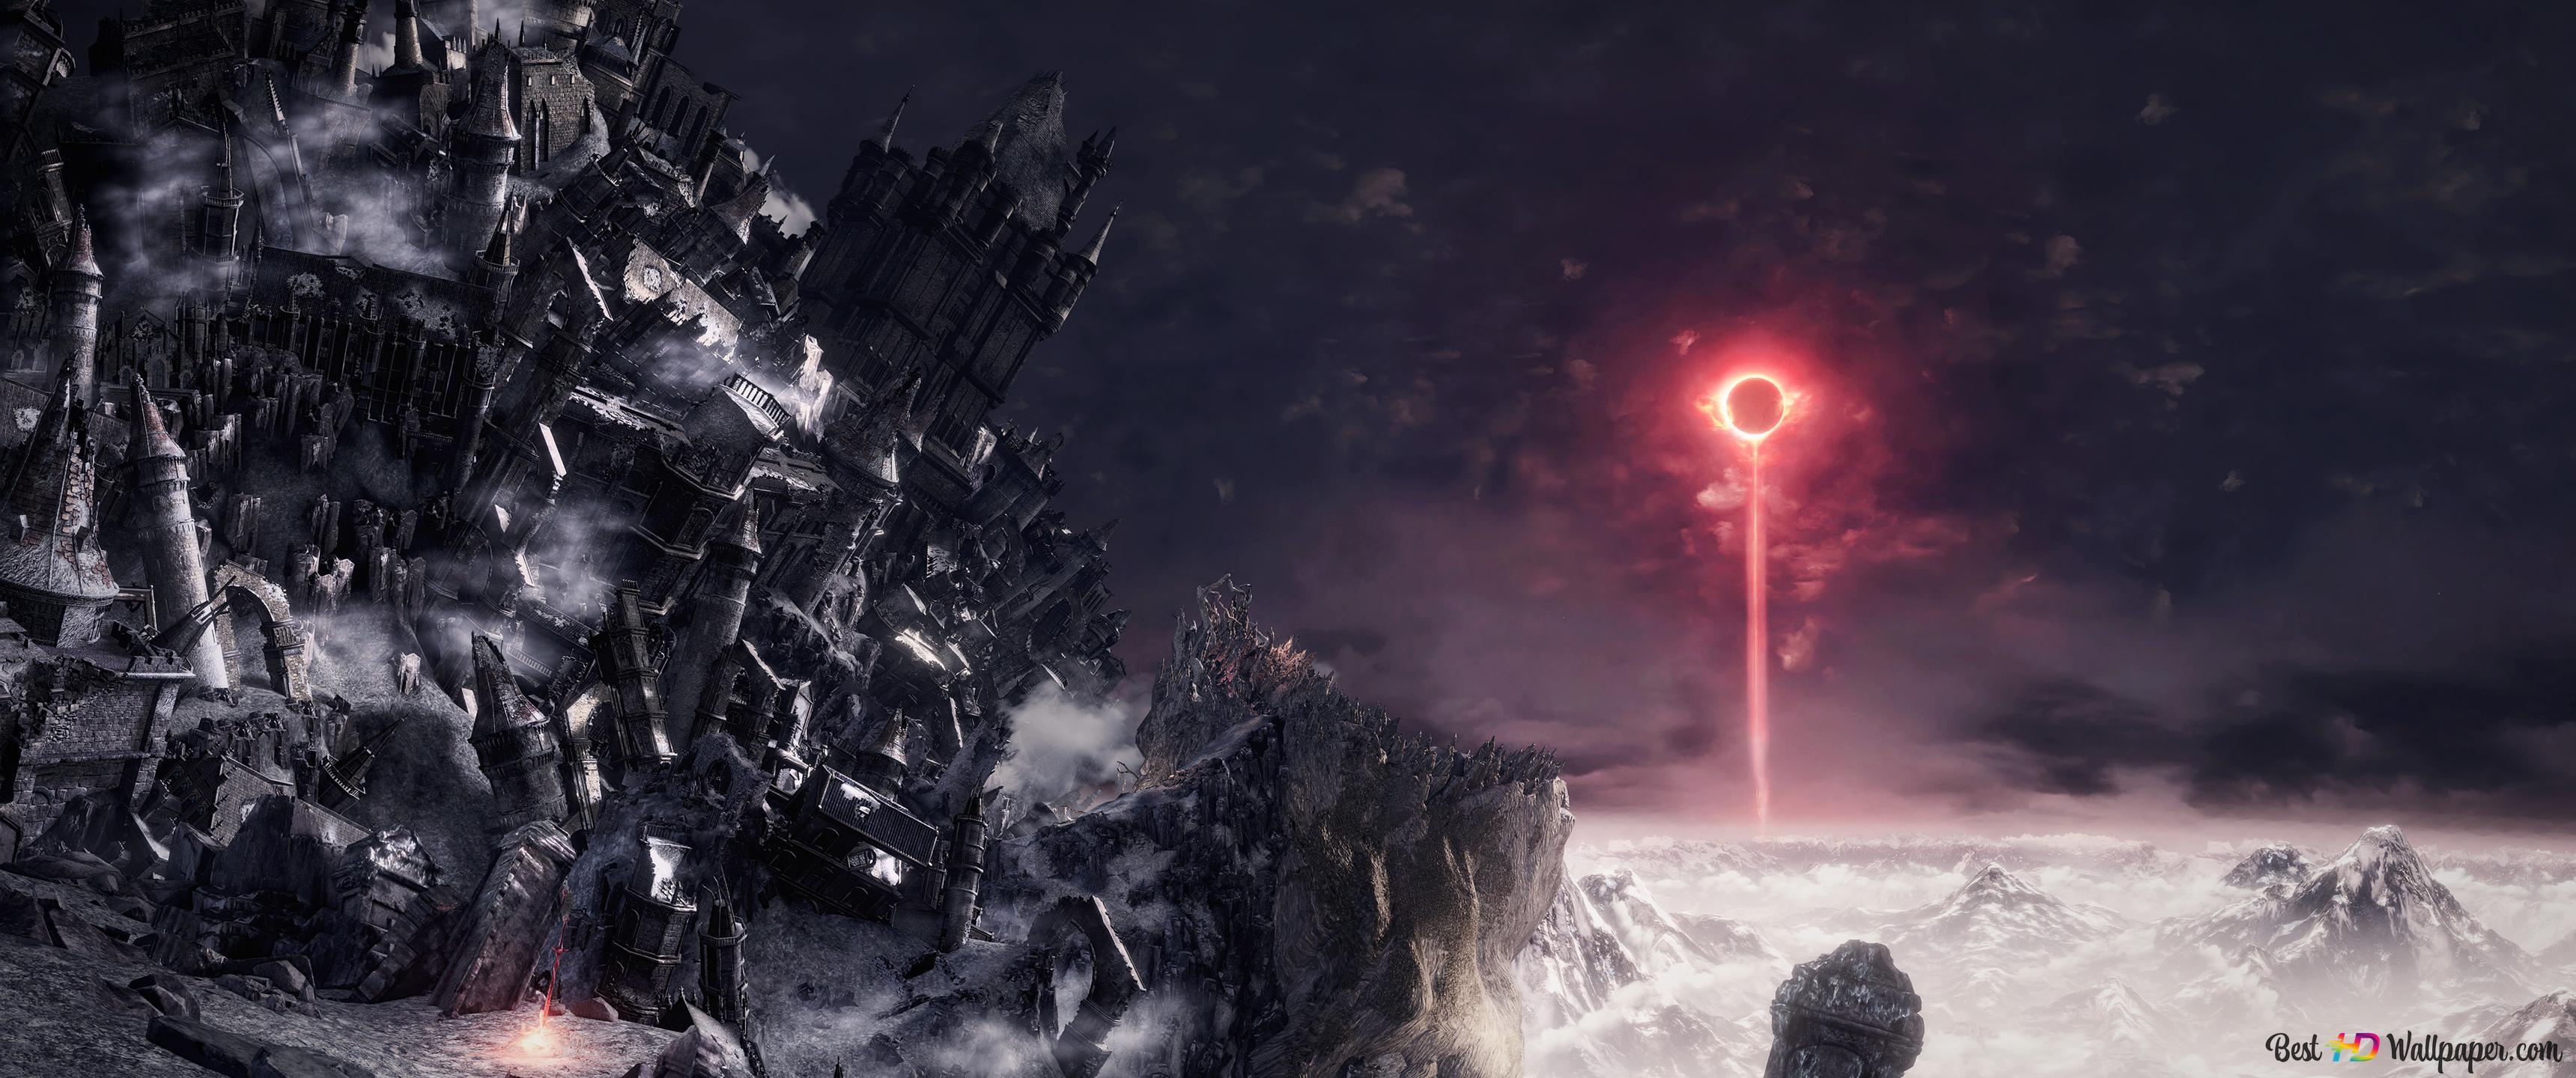 Dark Souls Iii Kiln Of The First Flame Hd Wallpaper Download